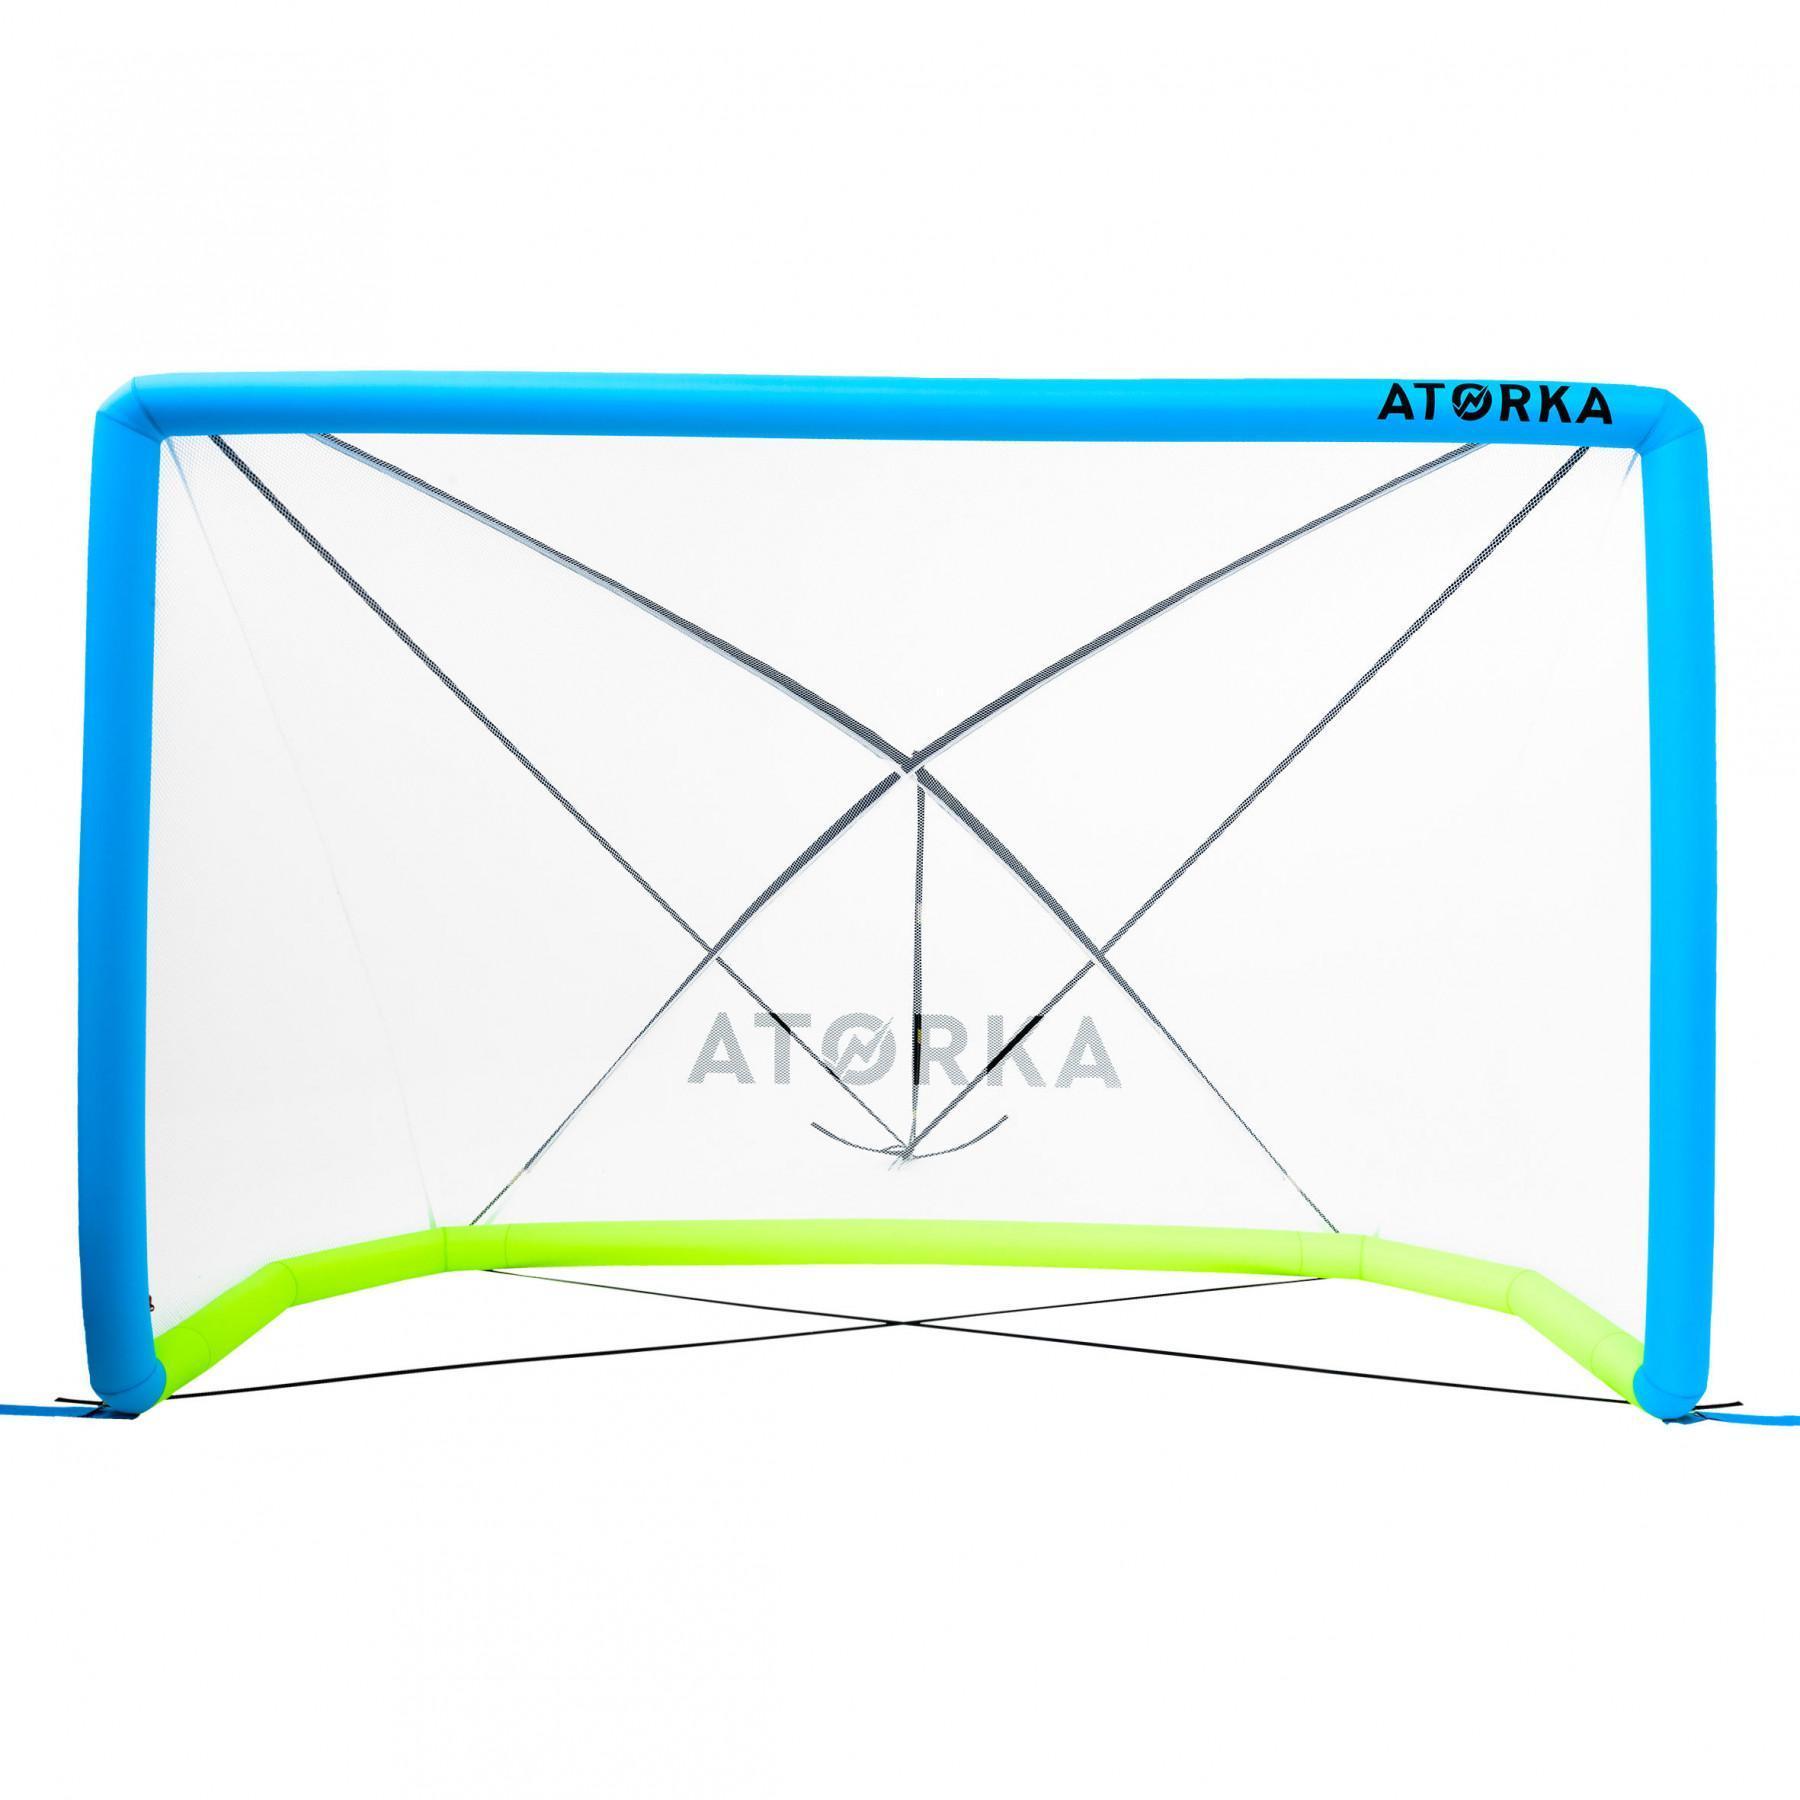 But gonflable de beach handball Atorka